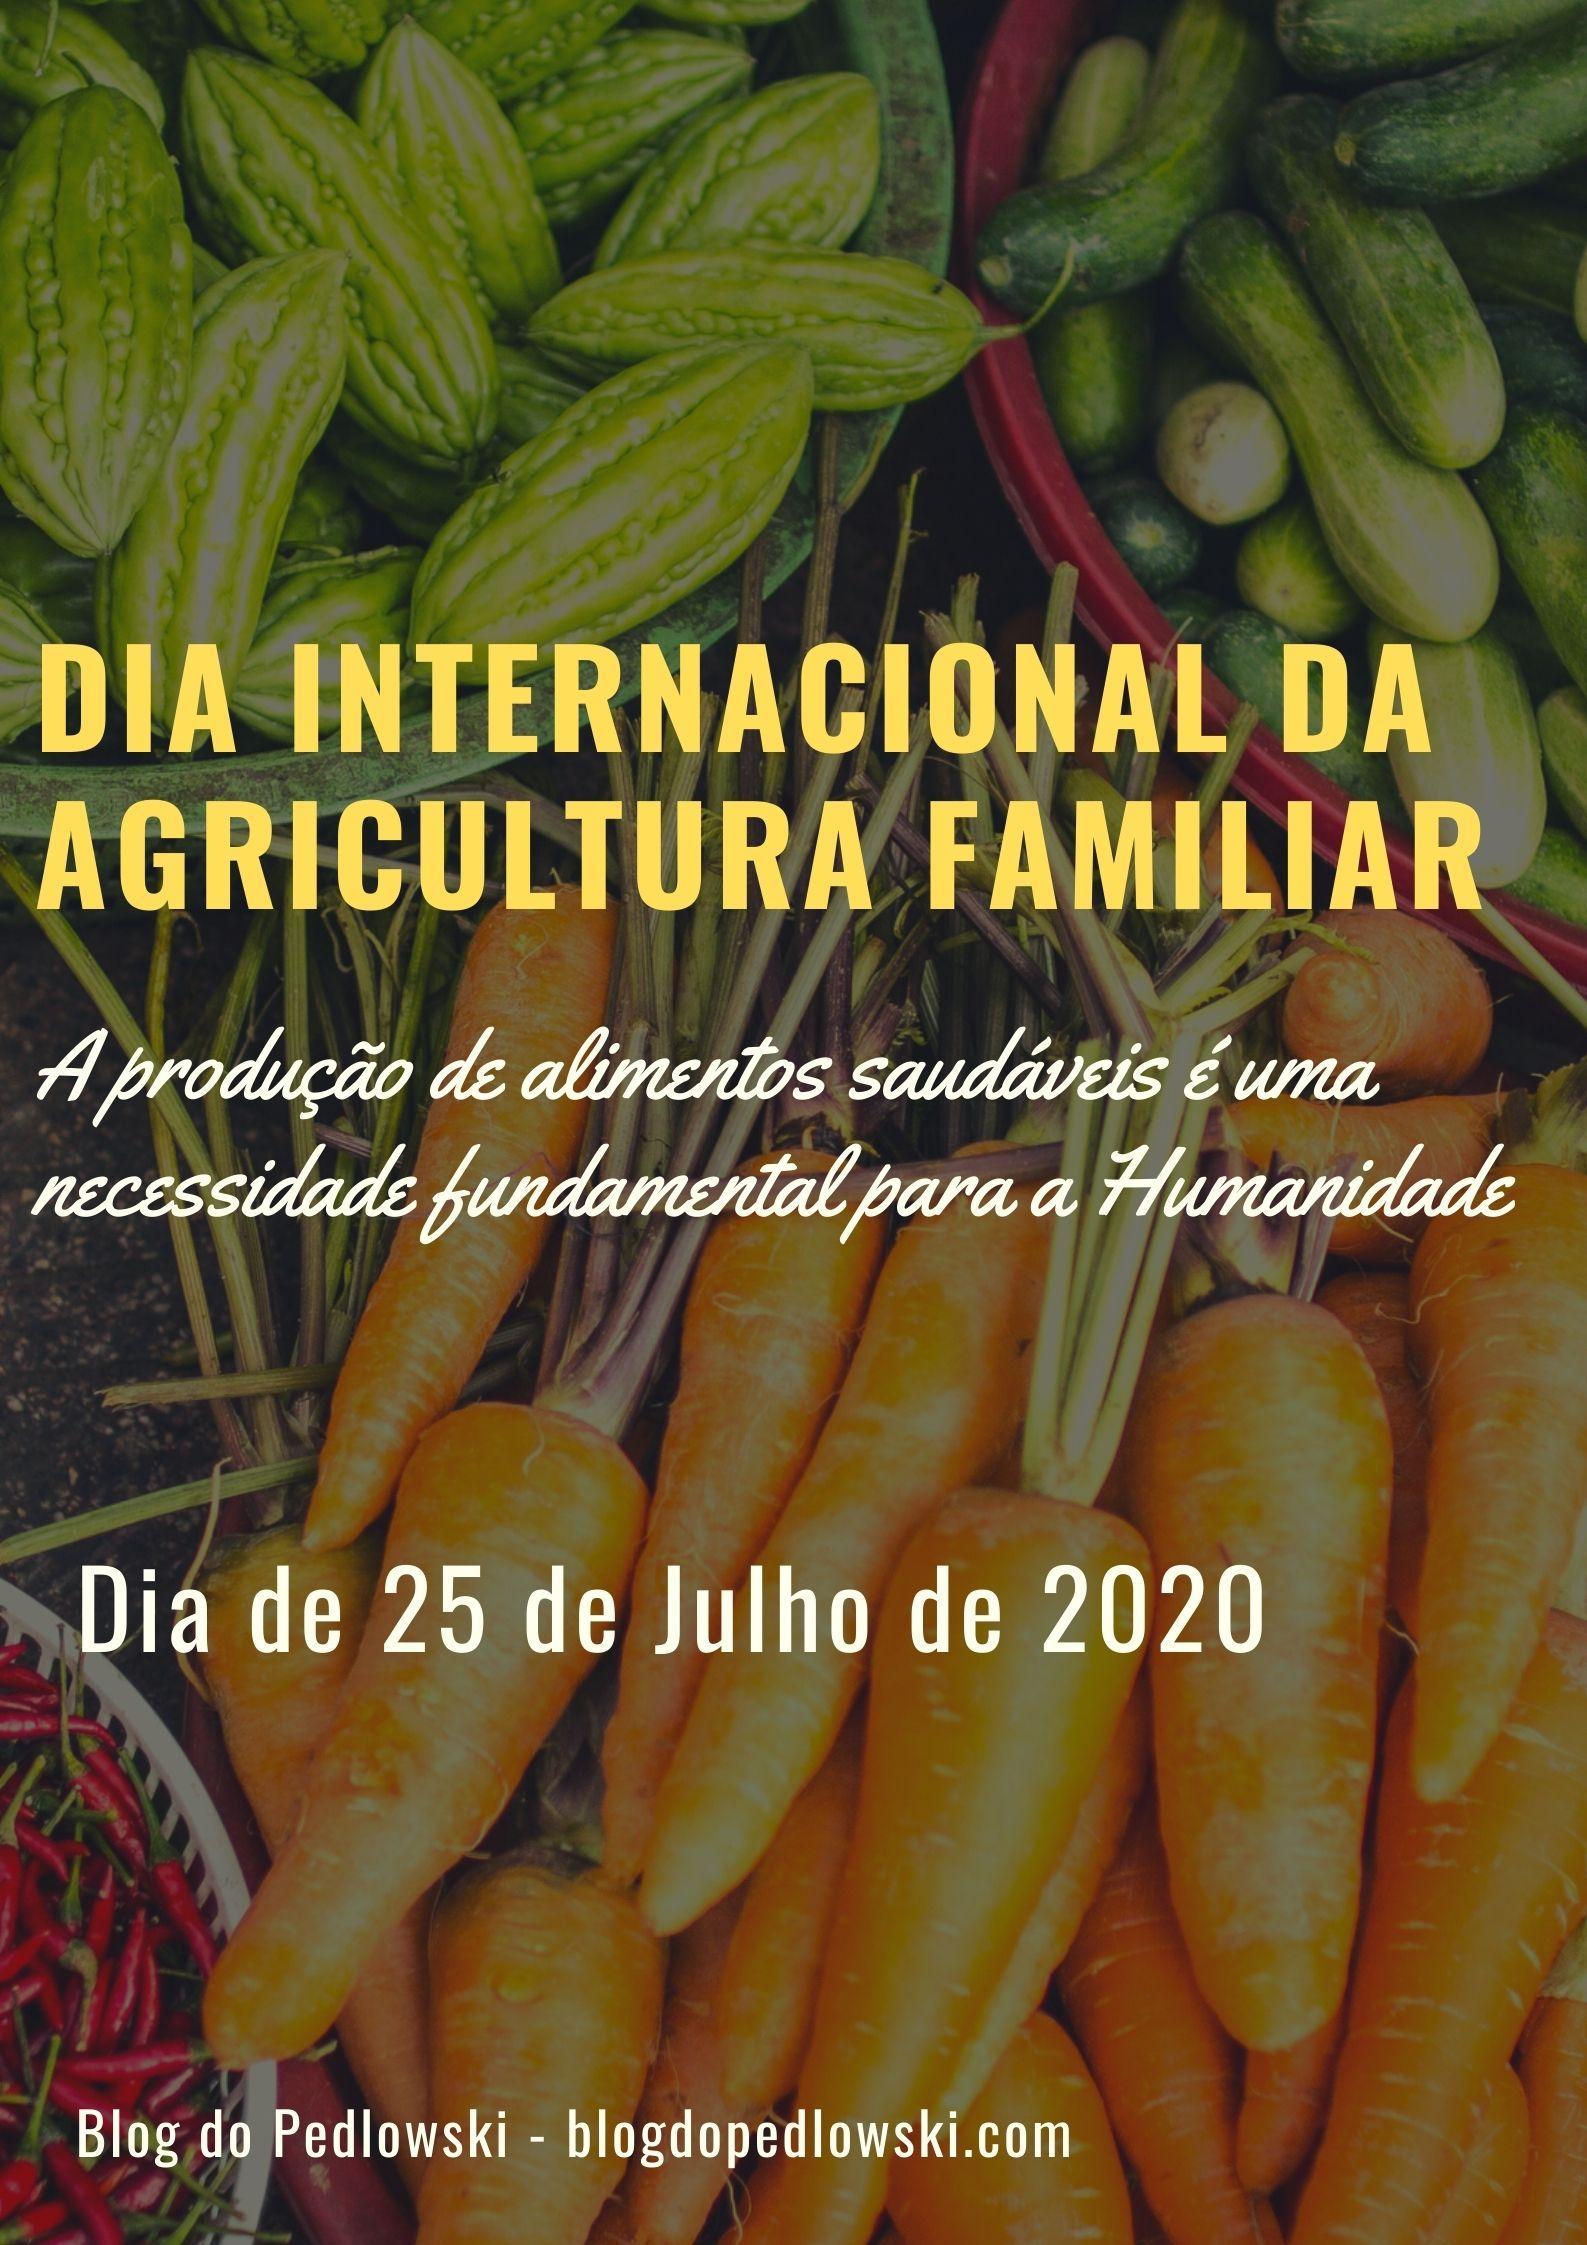 DIA INTERNACIONAL DA AGRICULTURA FAMILIAR